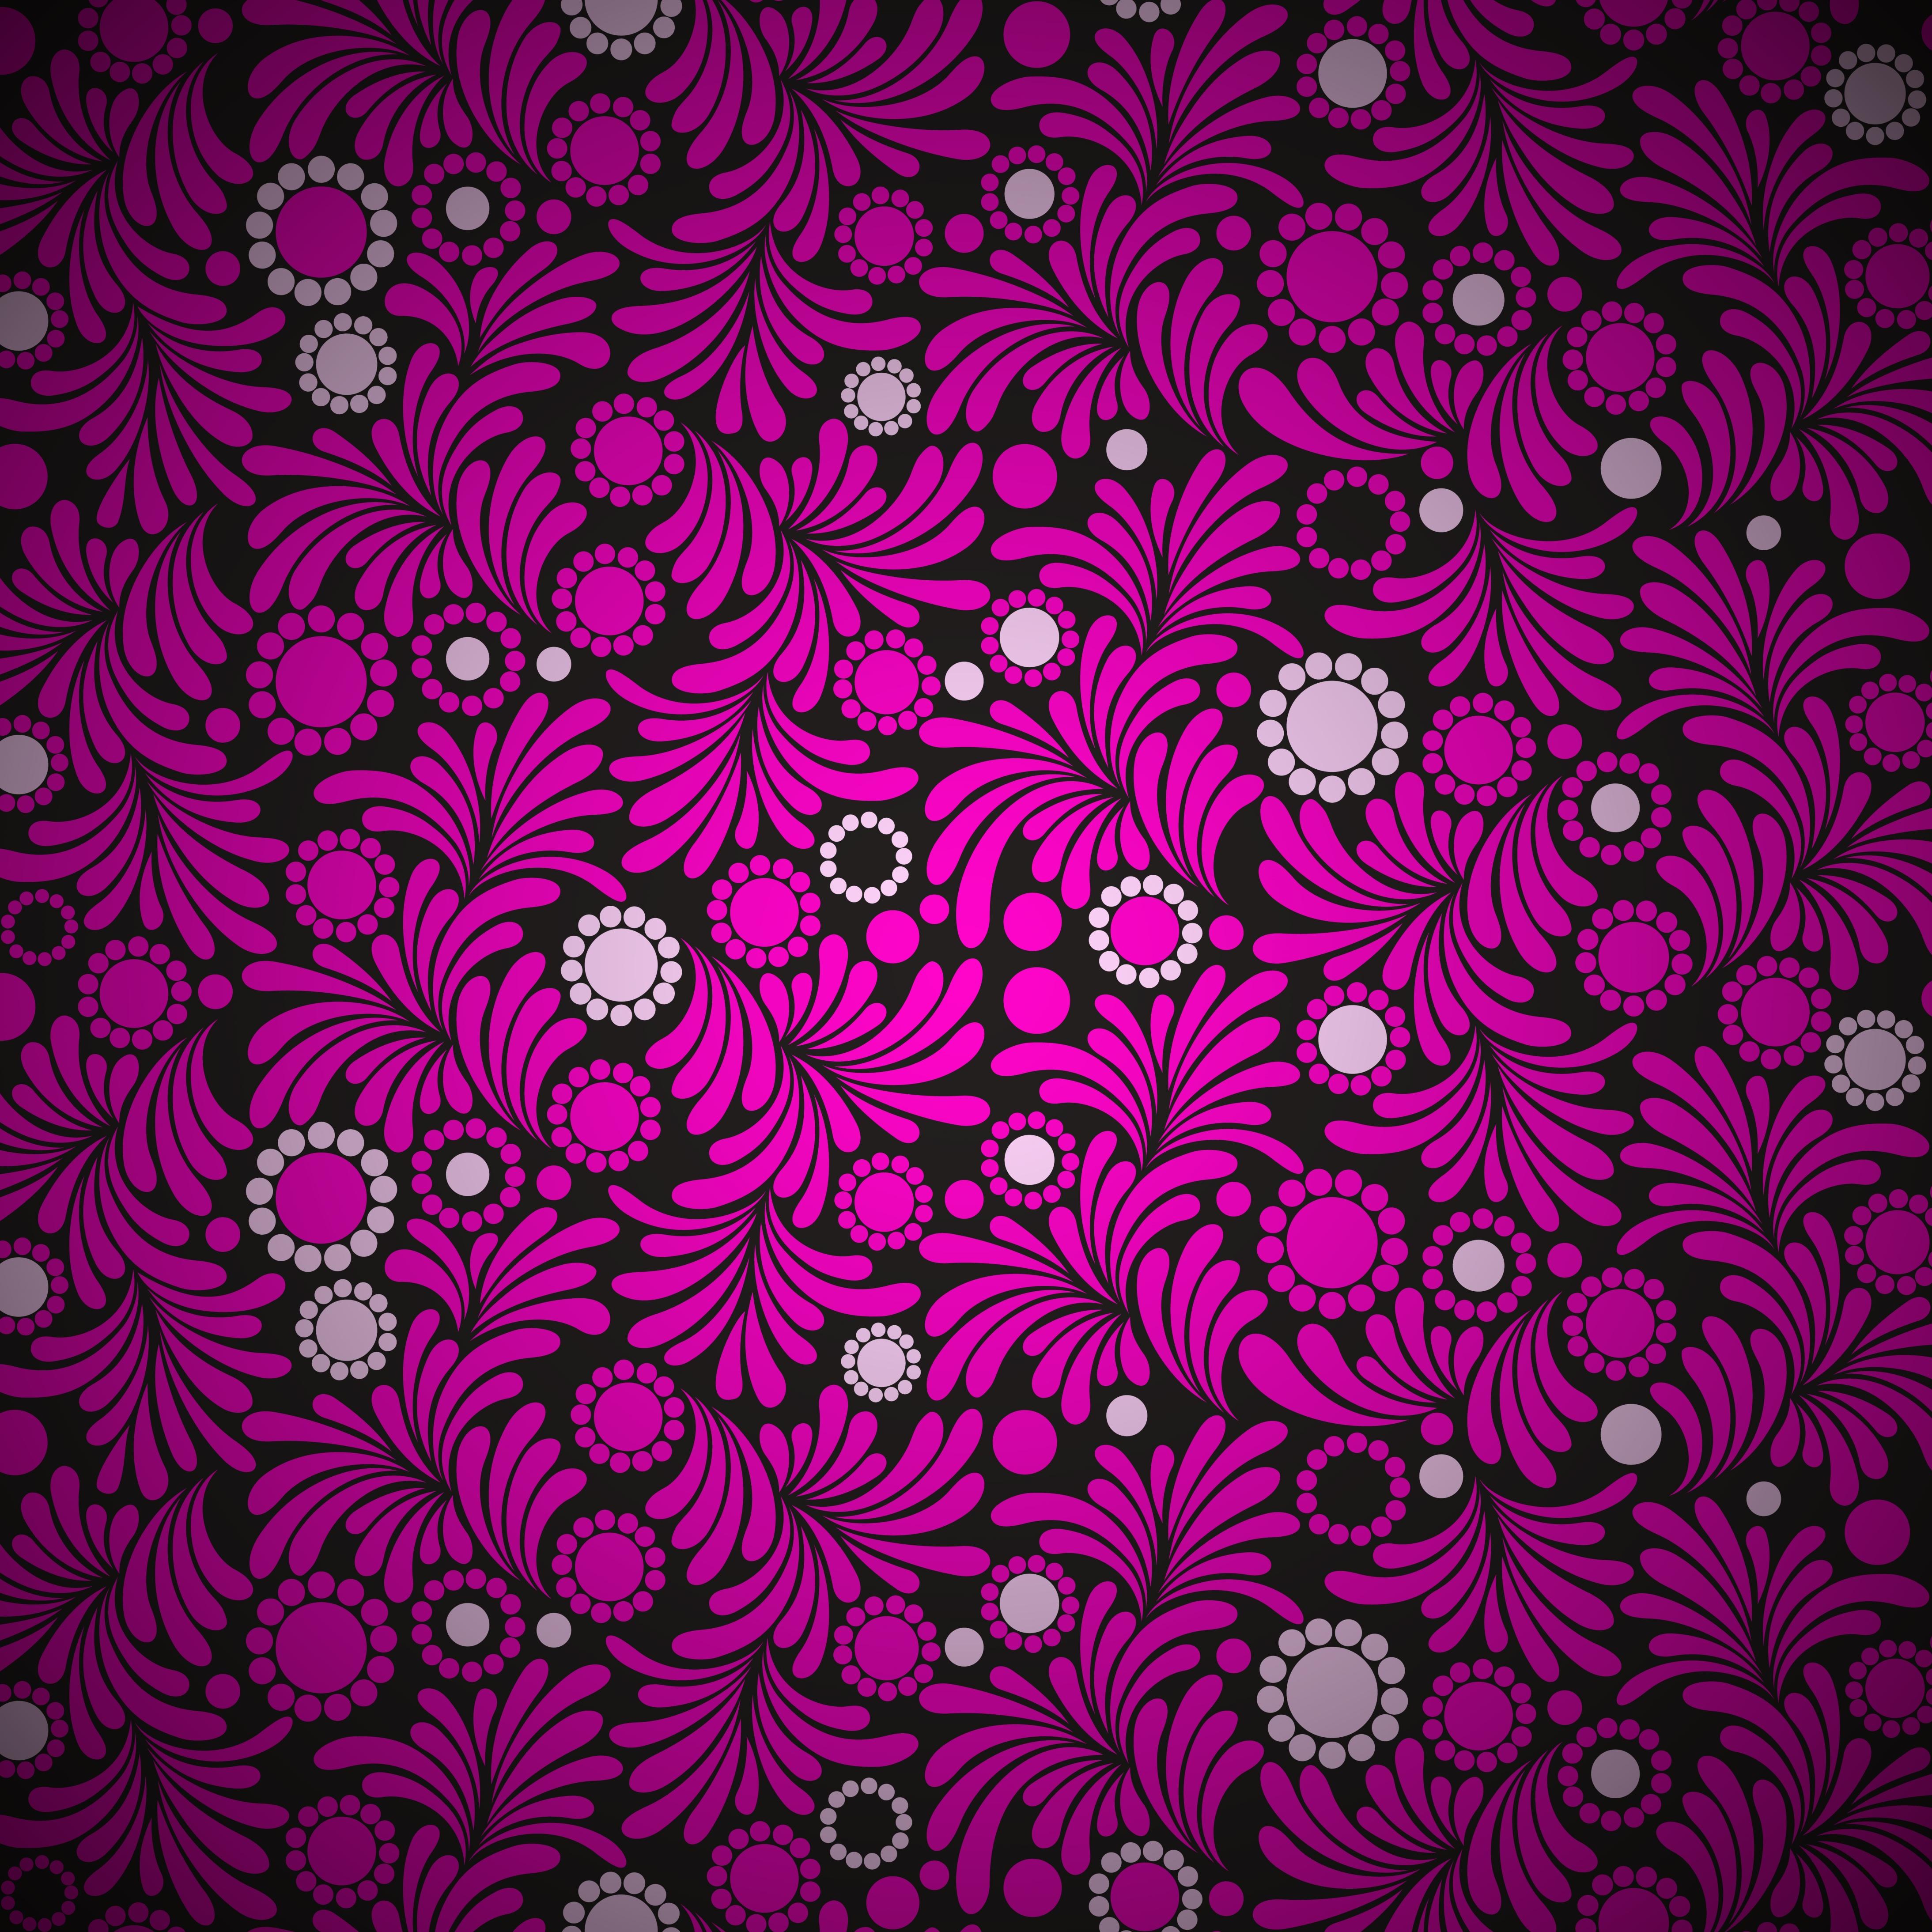 Seamless Purple Floral Wallpaper Download Free Vectors Clipart